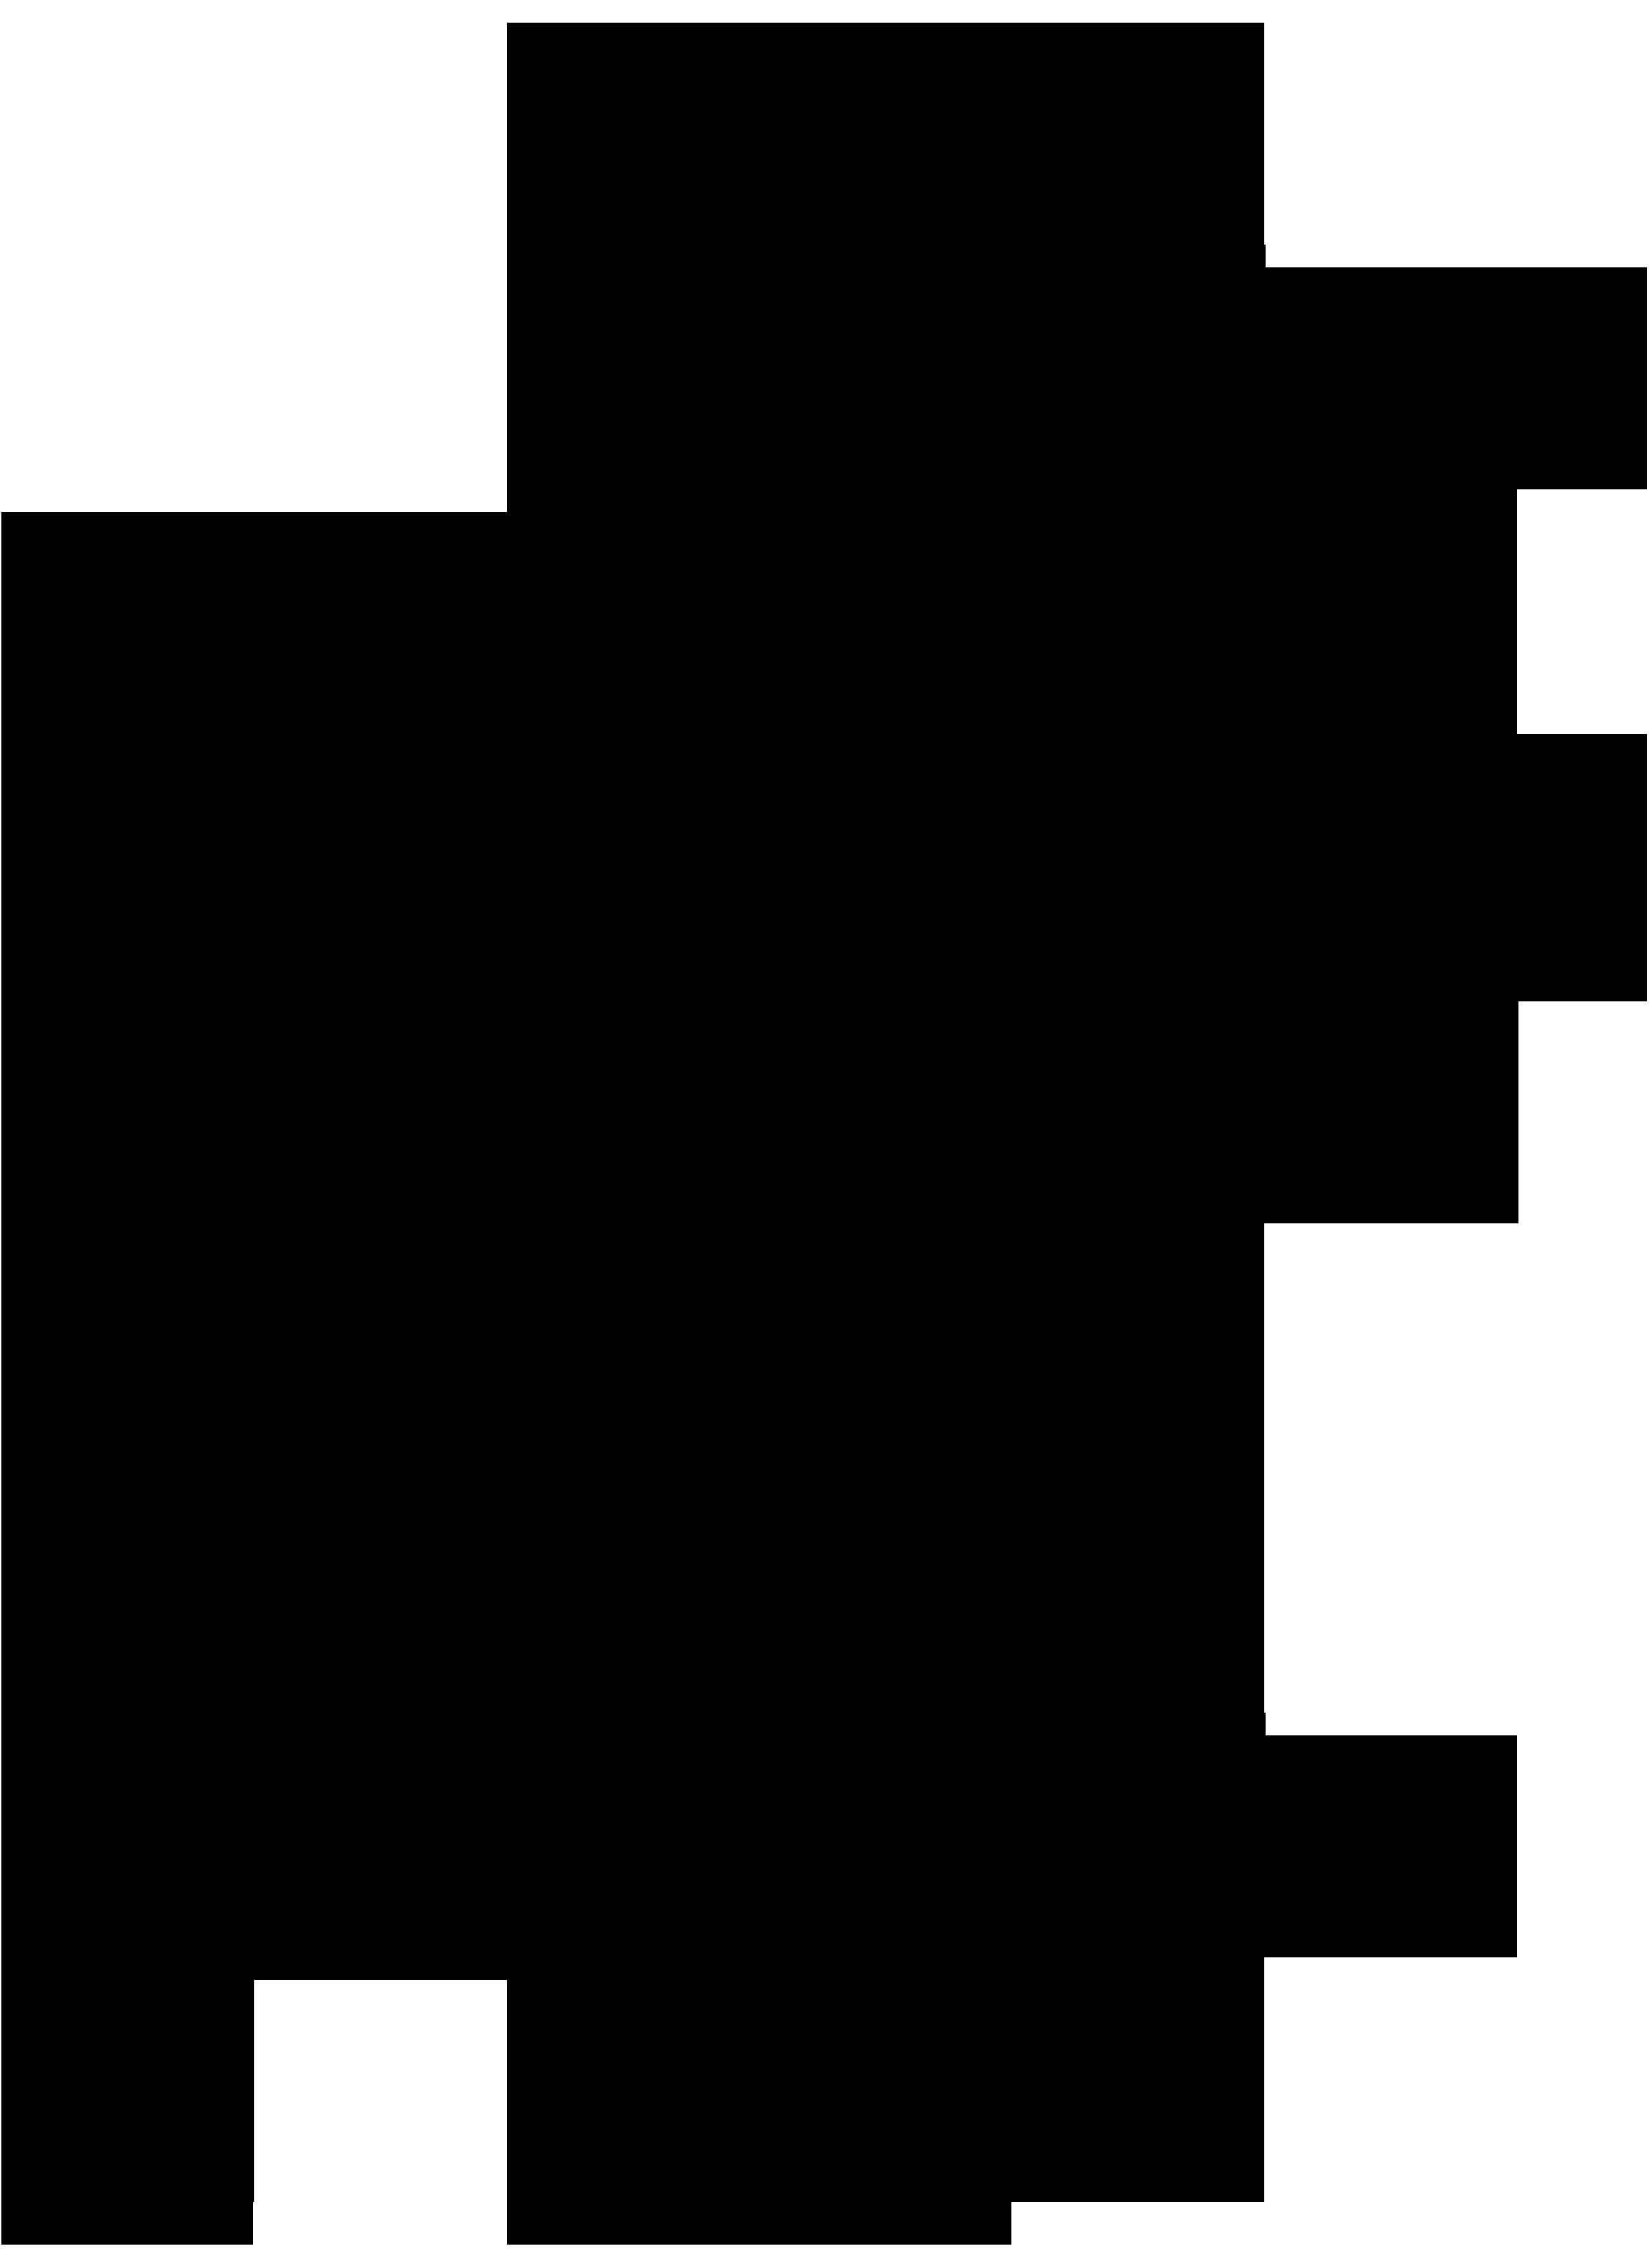 free_ornate_swirls_clipart_FPTFY_5.png (2400×3300